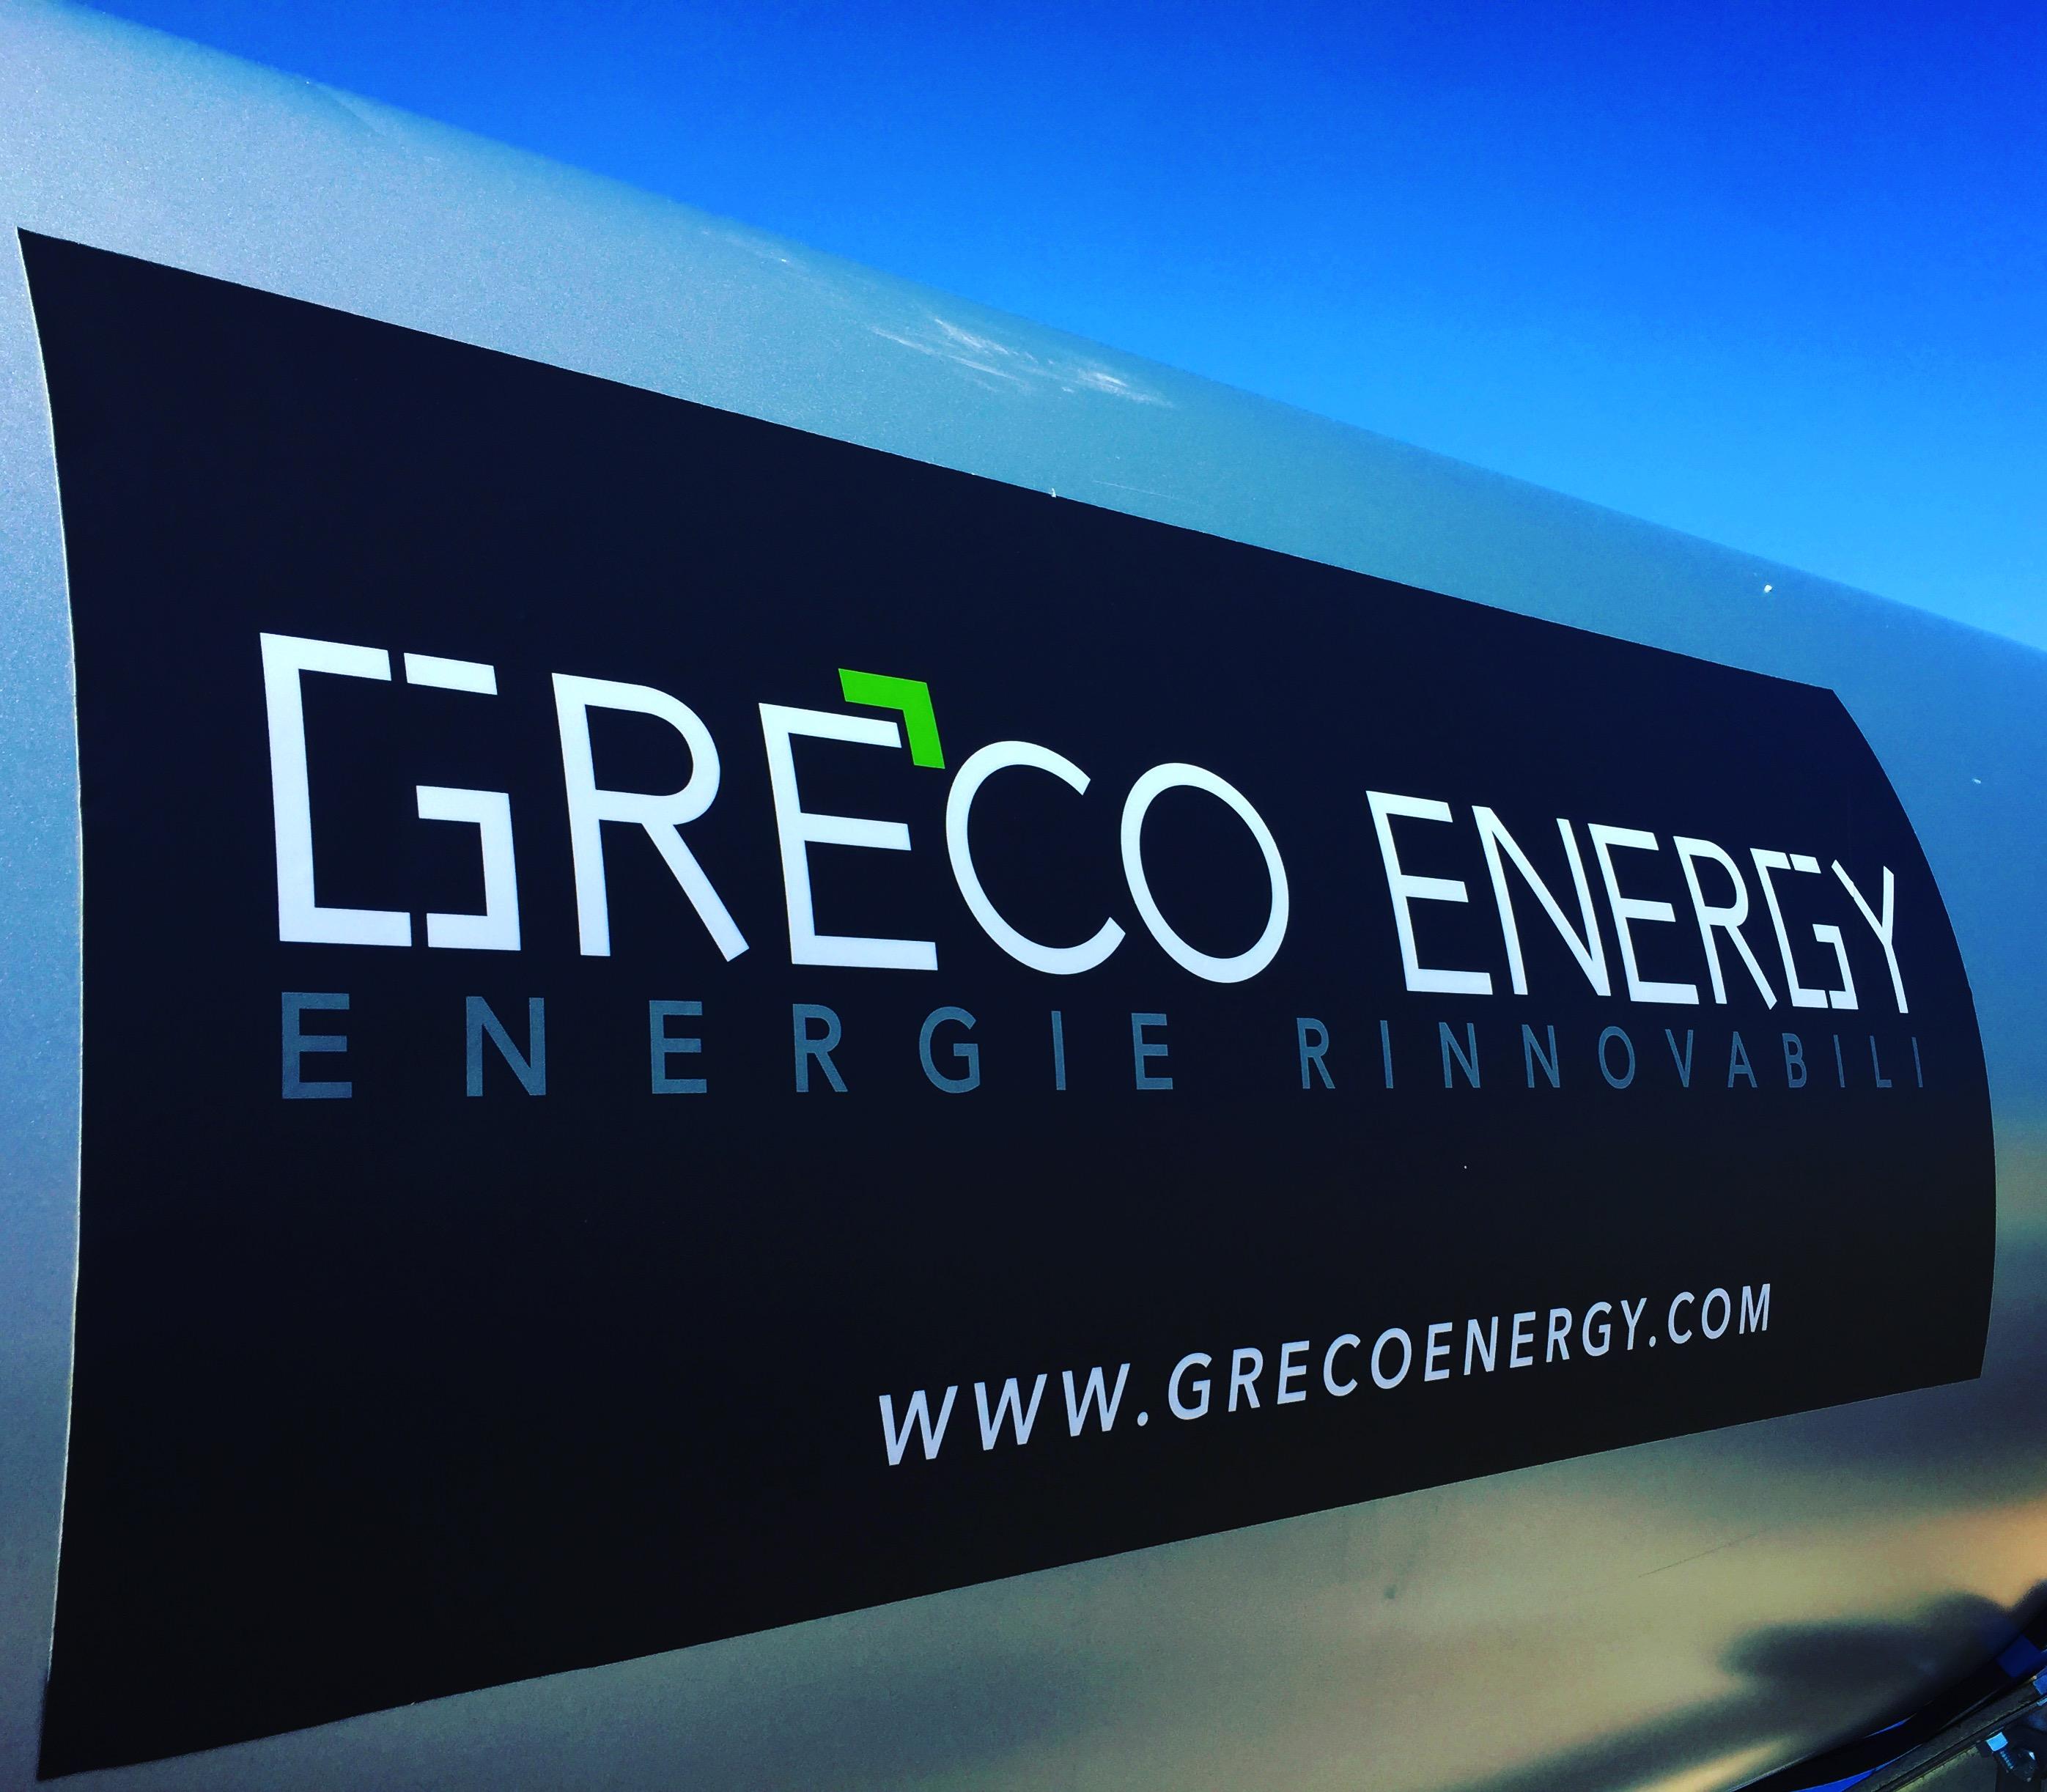 Greco Energy Energie Rinnovabili - Fotov